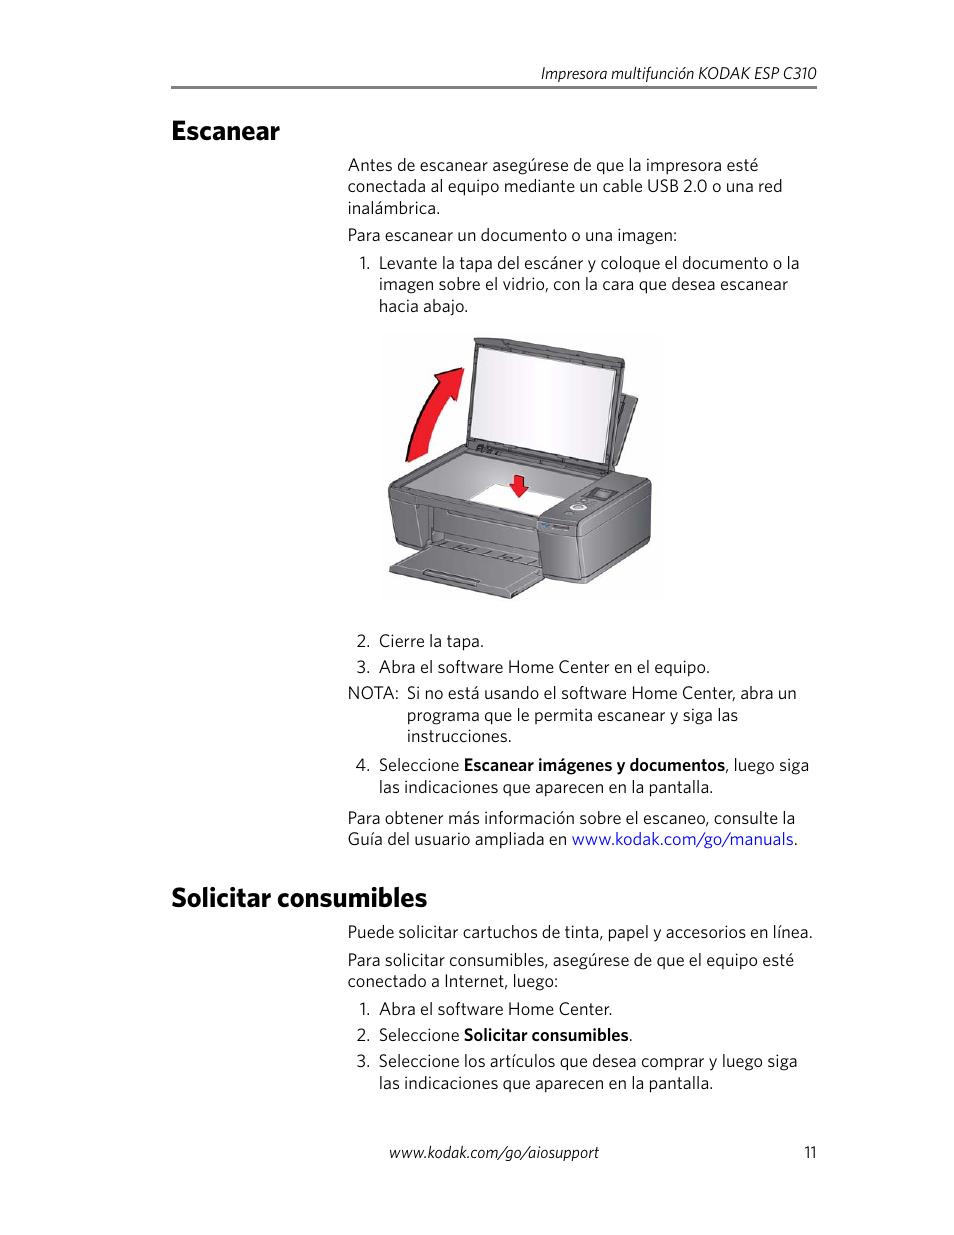 escanear solicitar consumibles escanear solicitar consumibles rh pdfmanuales com